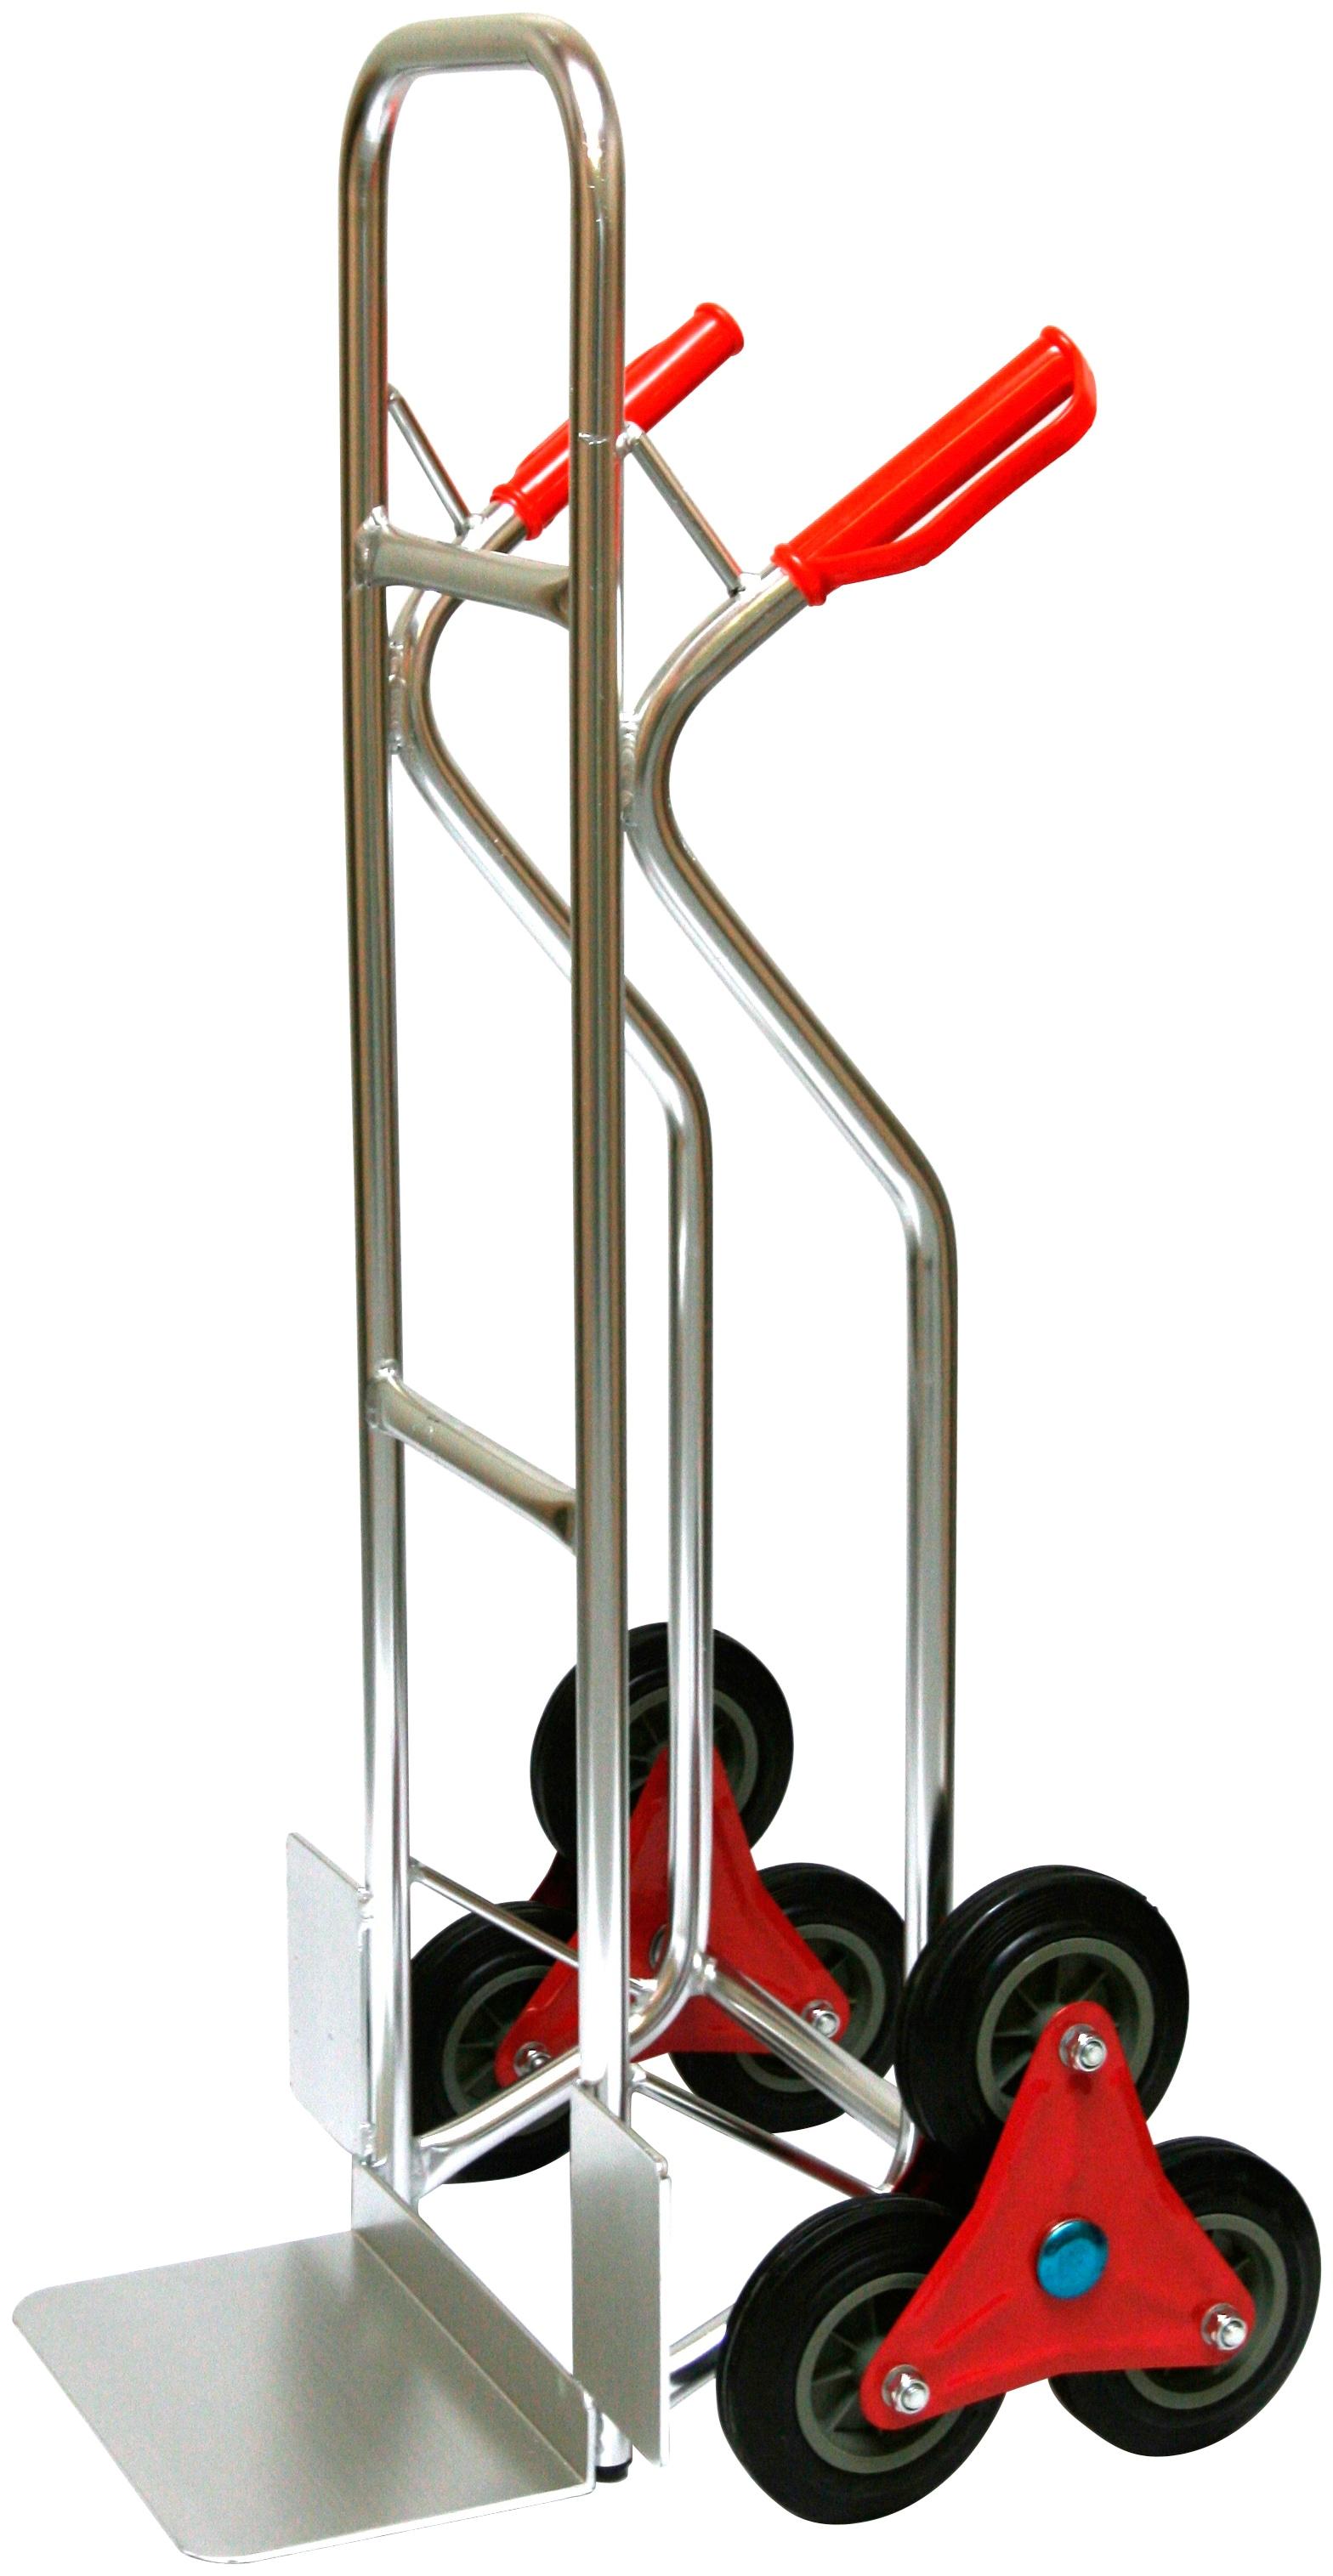 SZ METALL Treppensackkarre, 200 kg silberfarben Sackkarren Transport Werkzeug Maschinen